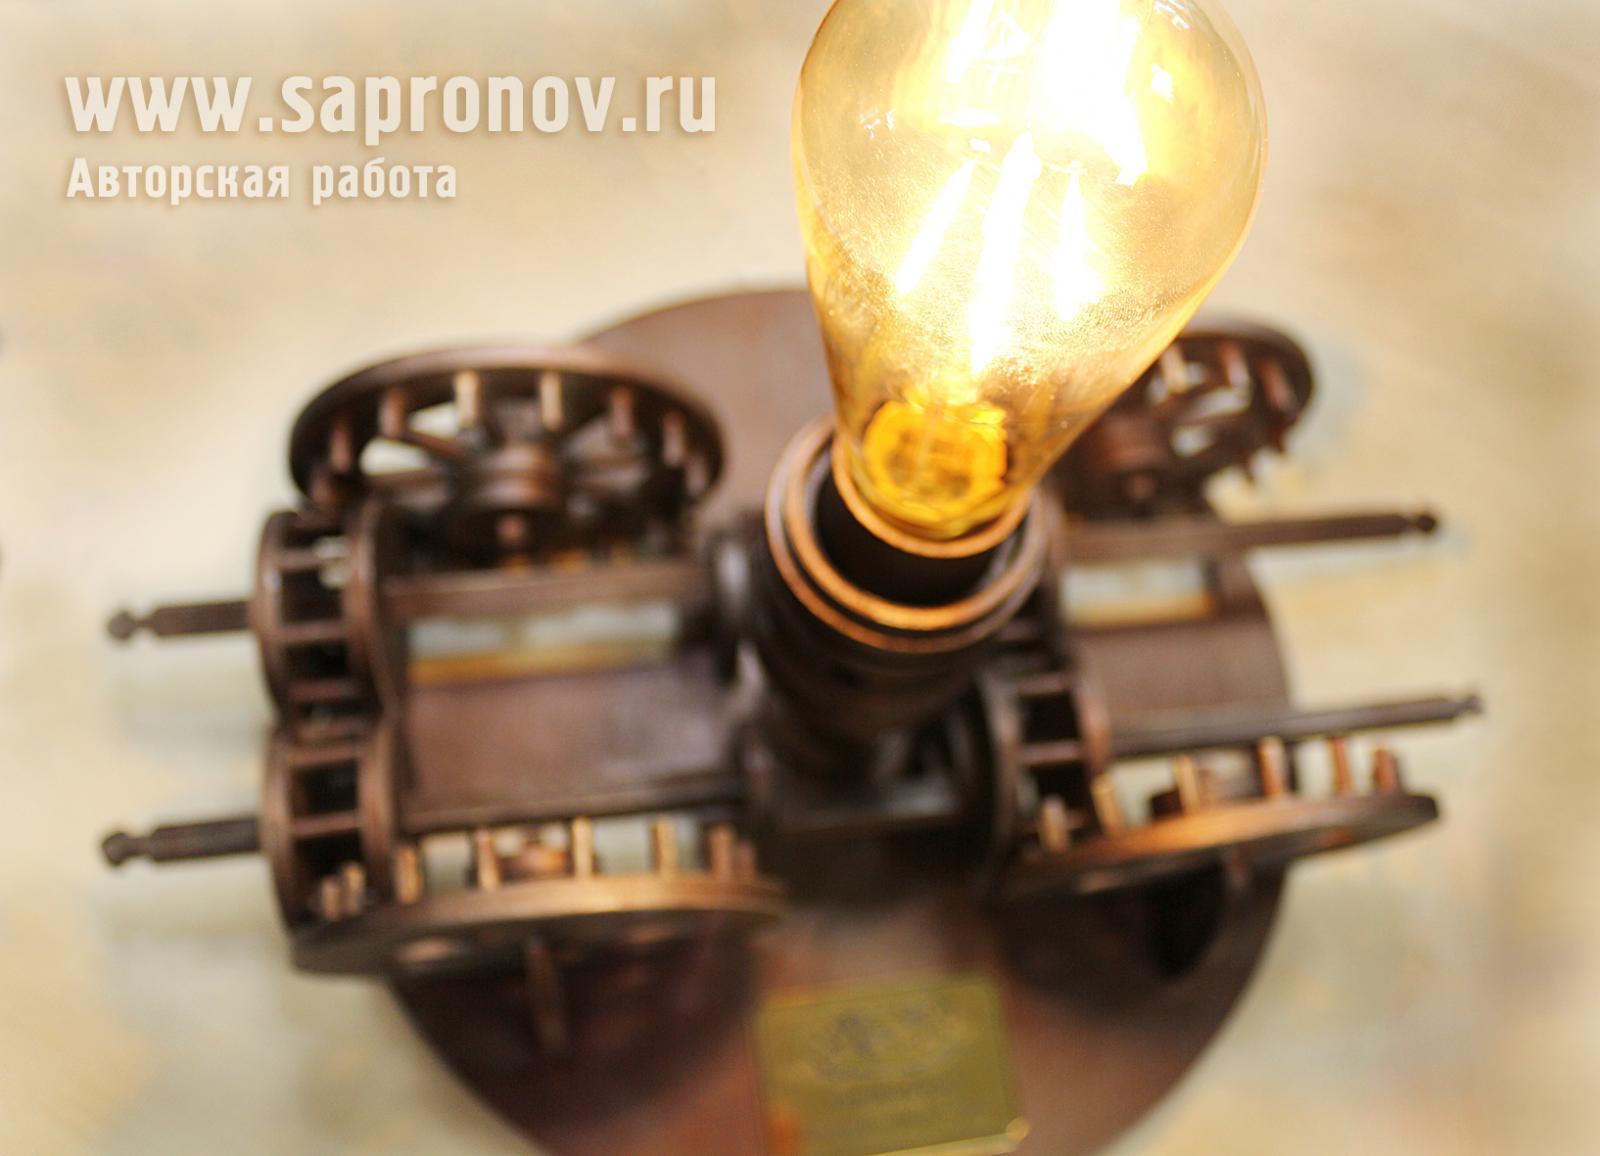 Мои работы www.sapronov.ru